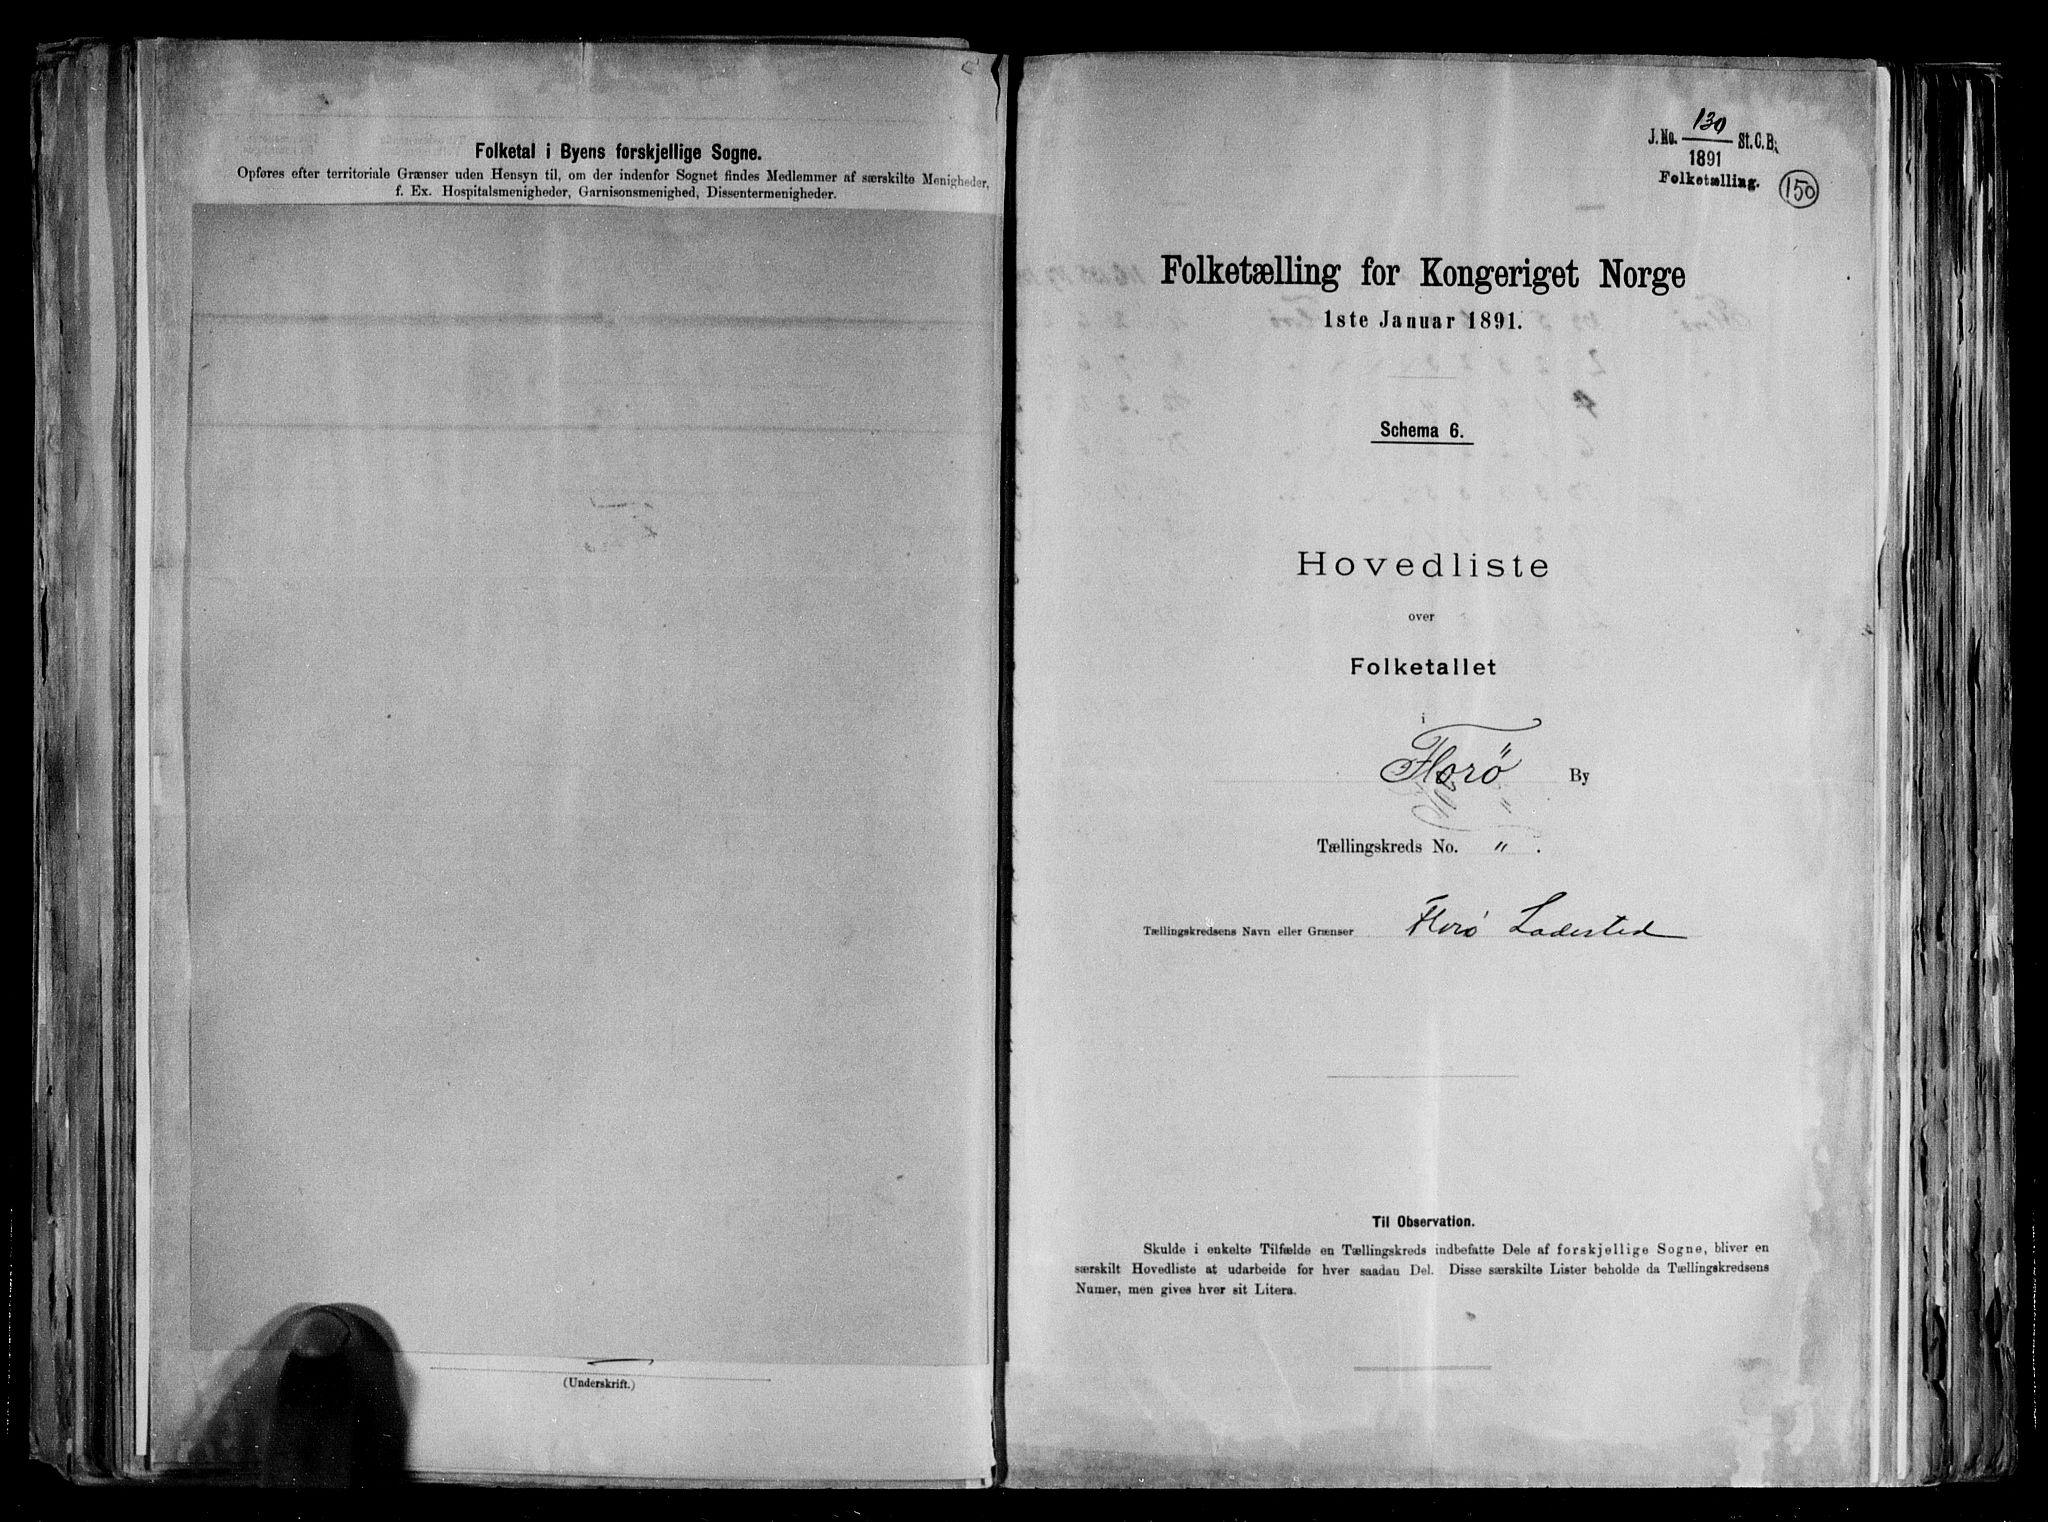 RA, Folketelling 1891 for 1401 Florø ladested, 1891, s. 5